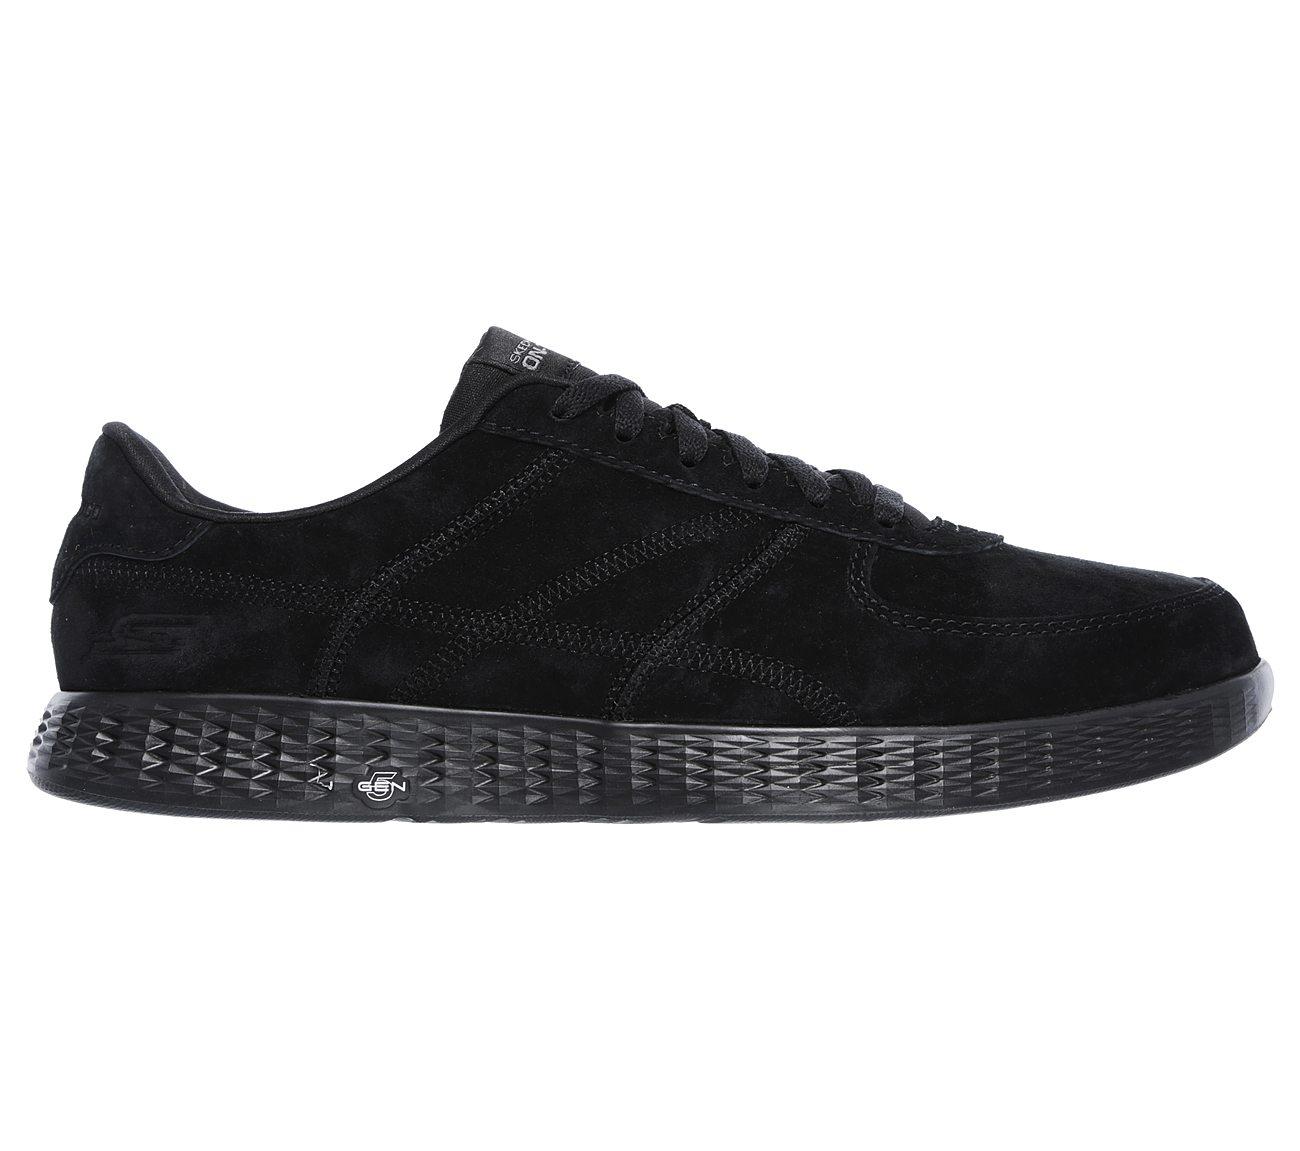 Skechers Men's On The go Glide Sneaker